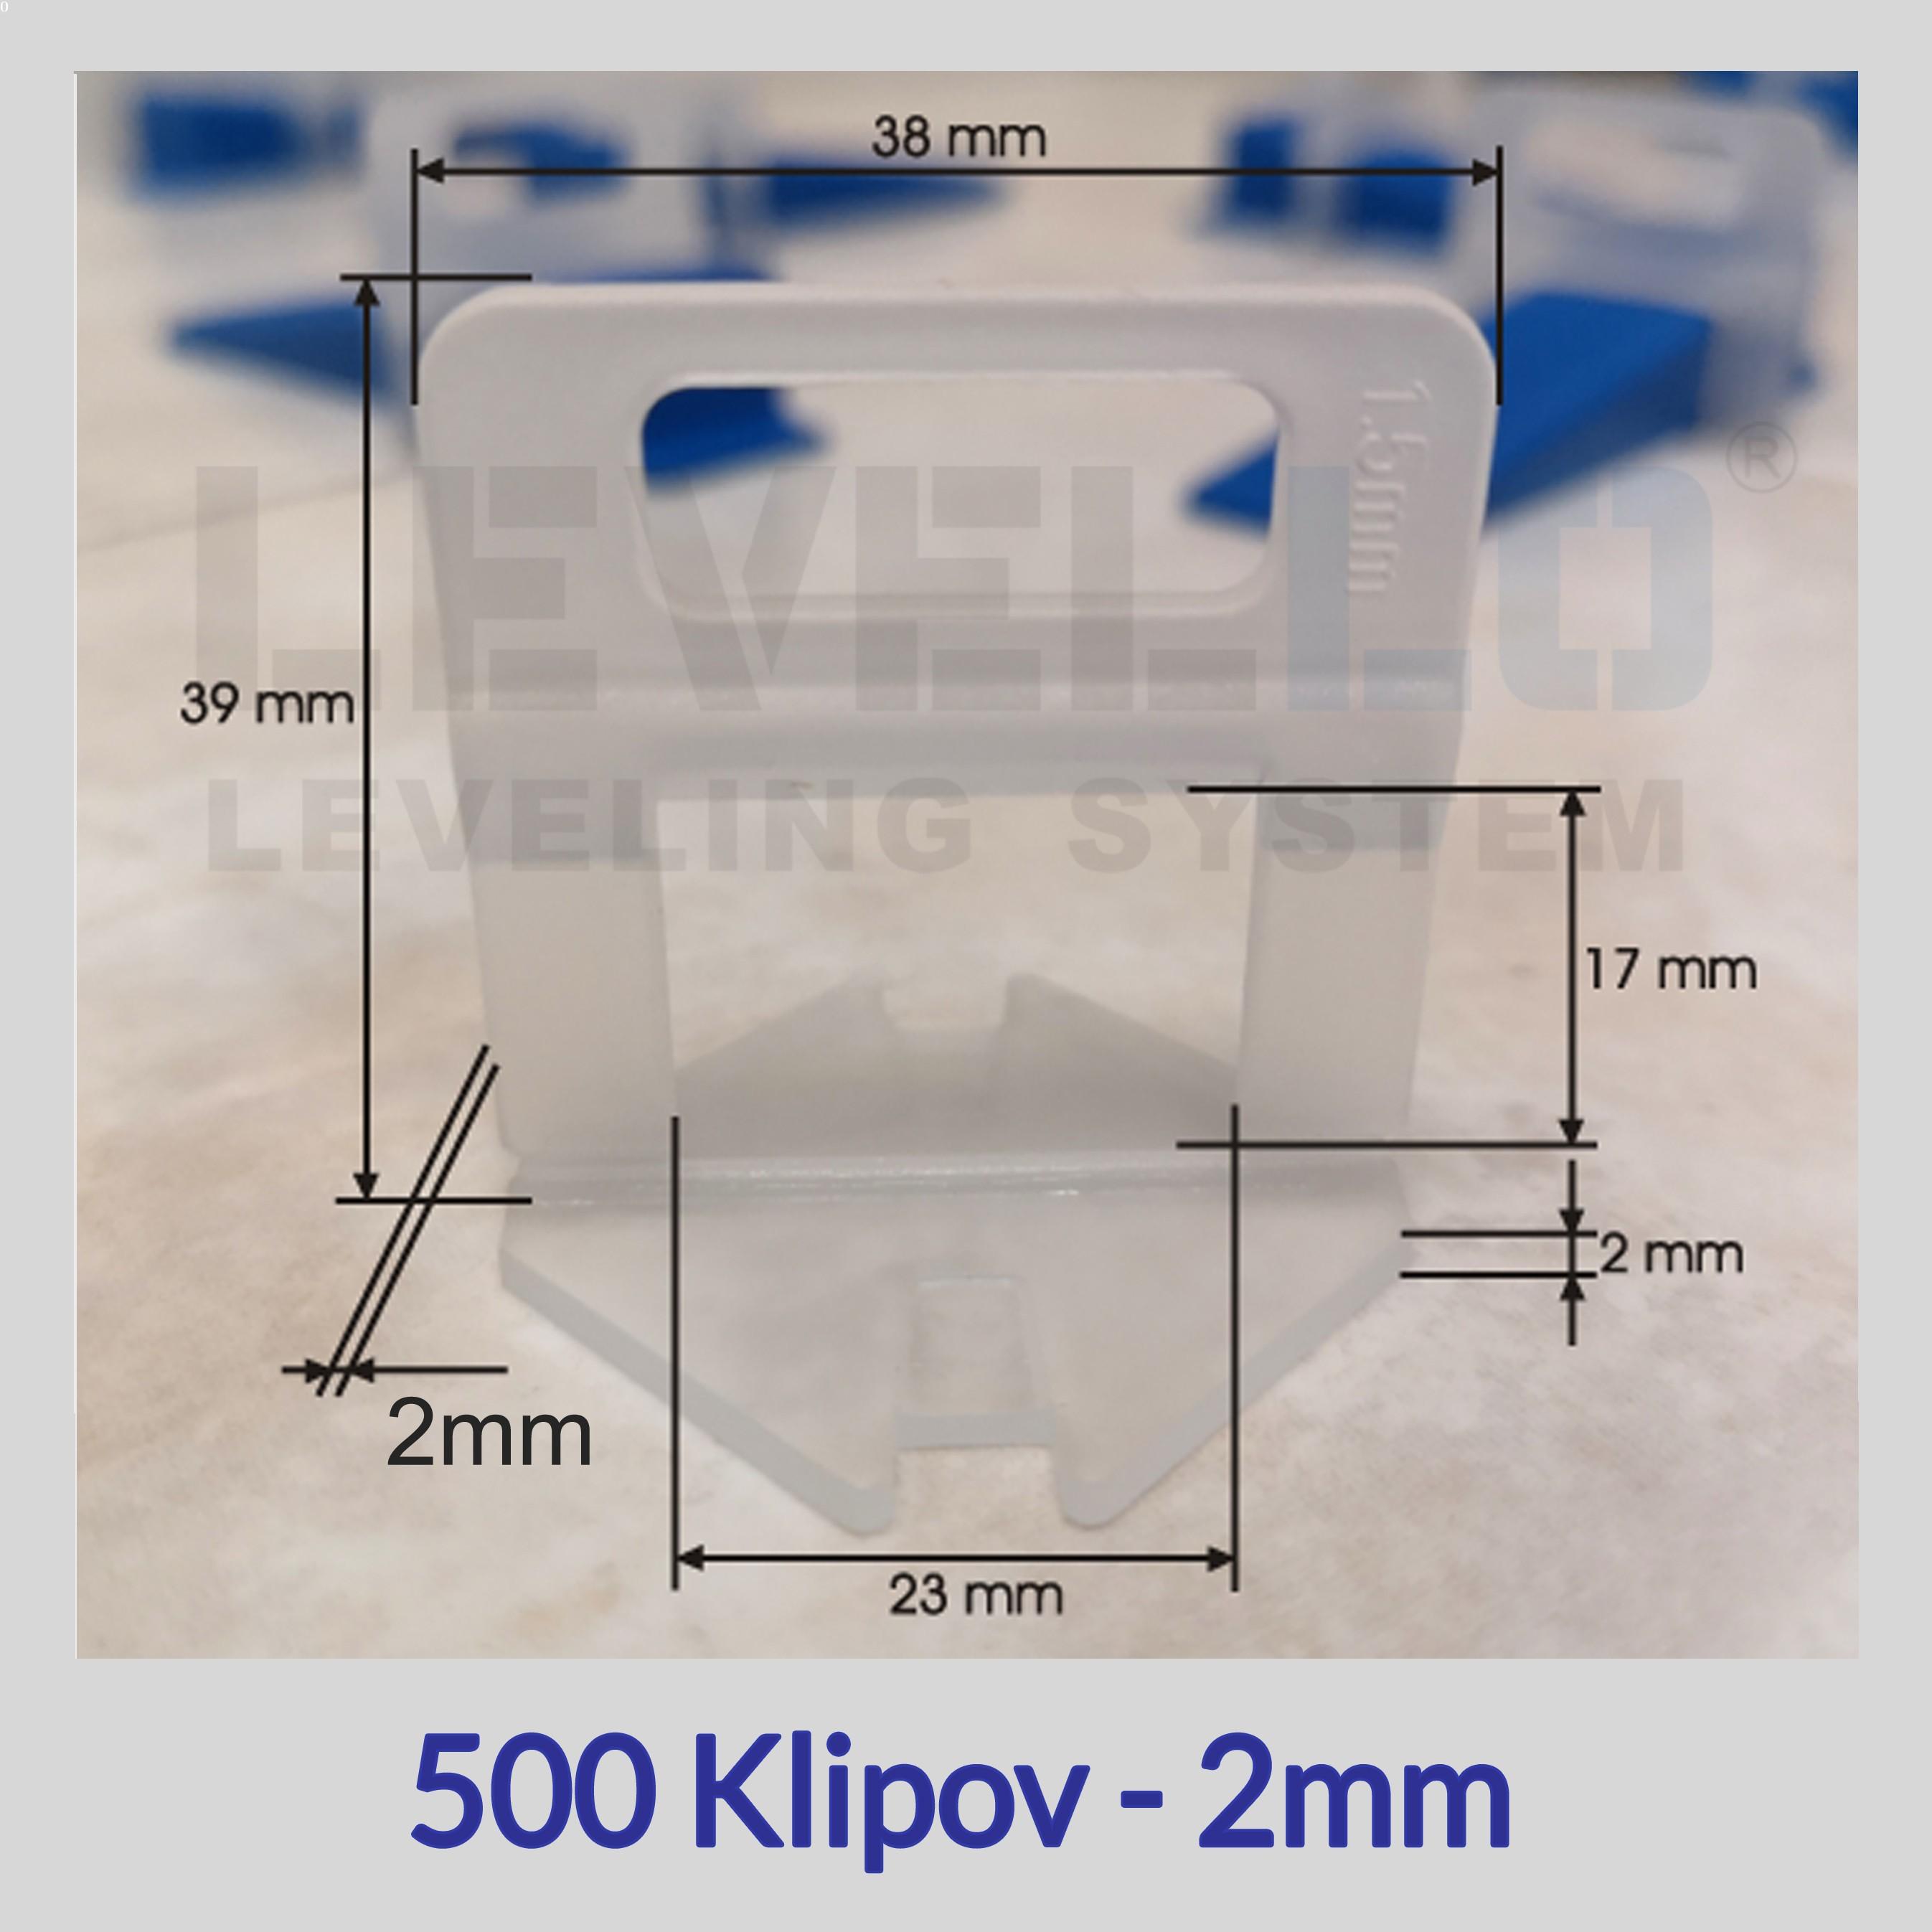 Klipy Eko LEVELLO ® 2 mm, 500 kusov